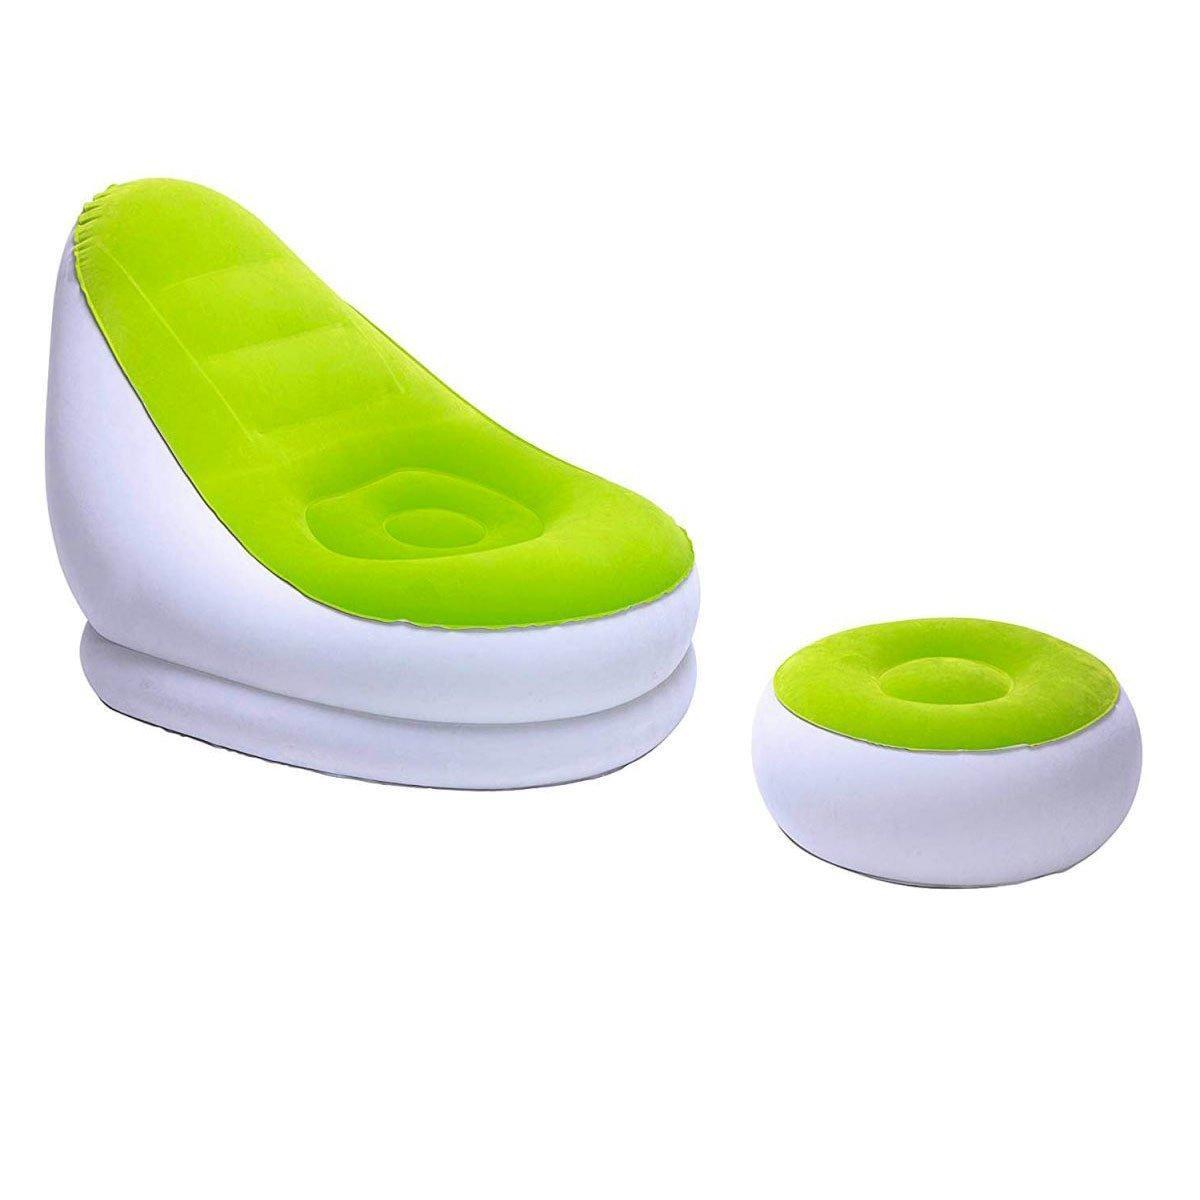 Надувное кресло Bestway 75053, 122 х 81 х 94 см, пуфик 54 х 26 см, зеленое